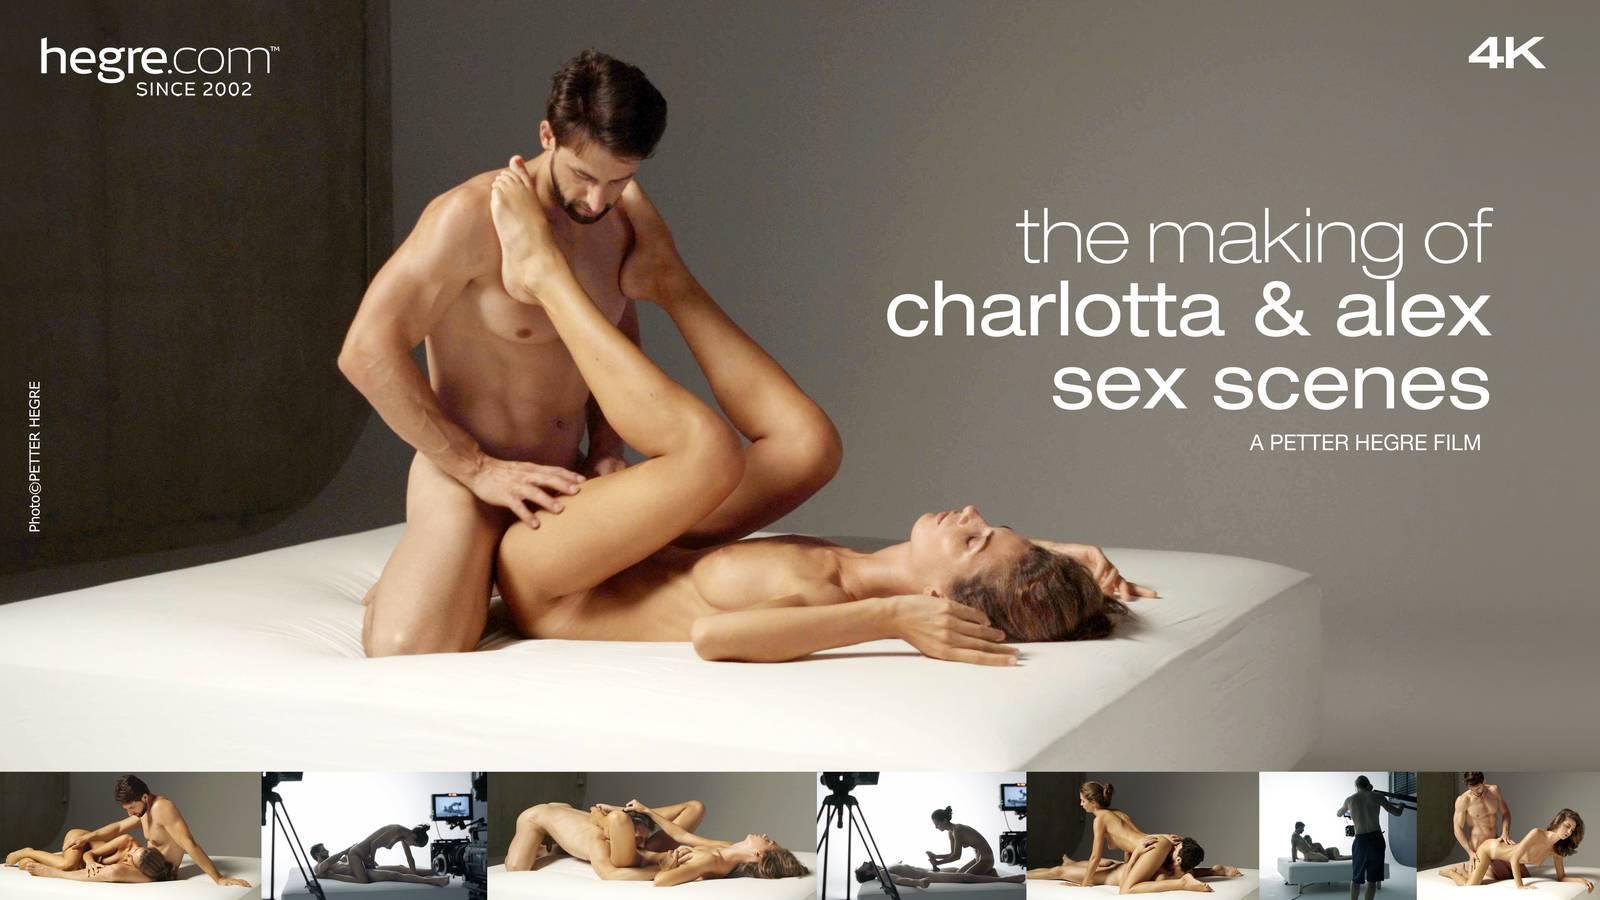 sex scenes and videos